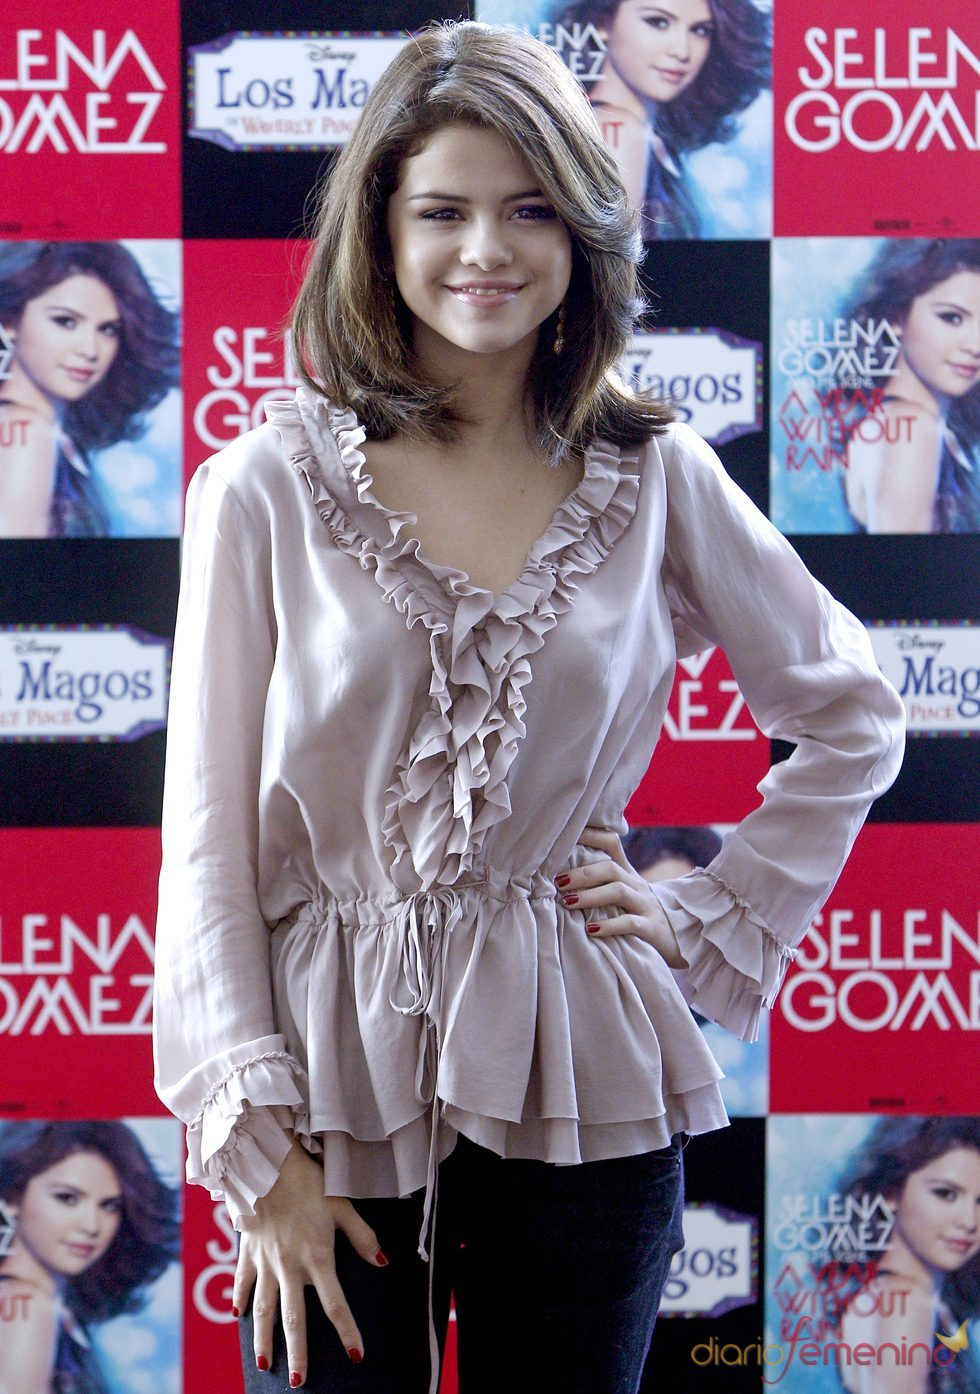 Selena Gomez presenta en Madrid 'A year without rain'